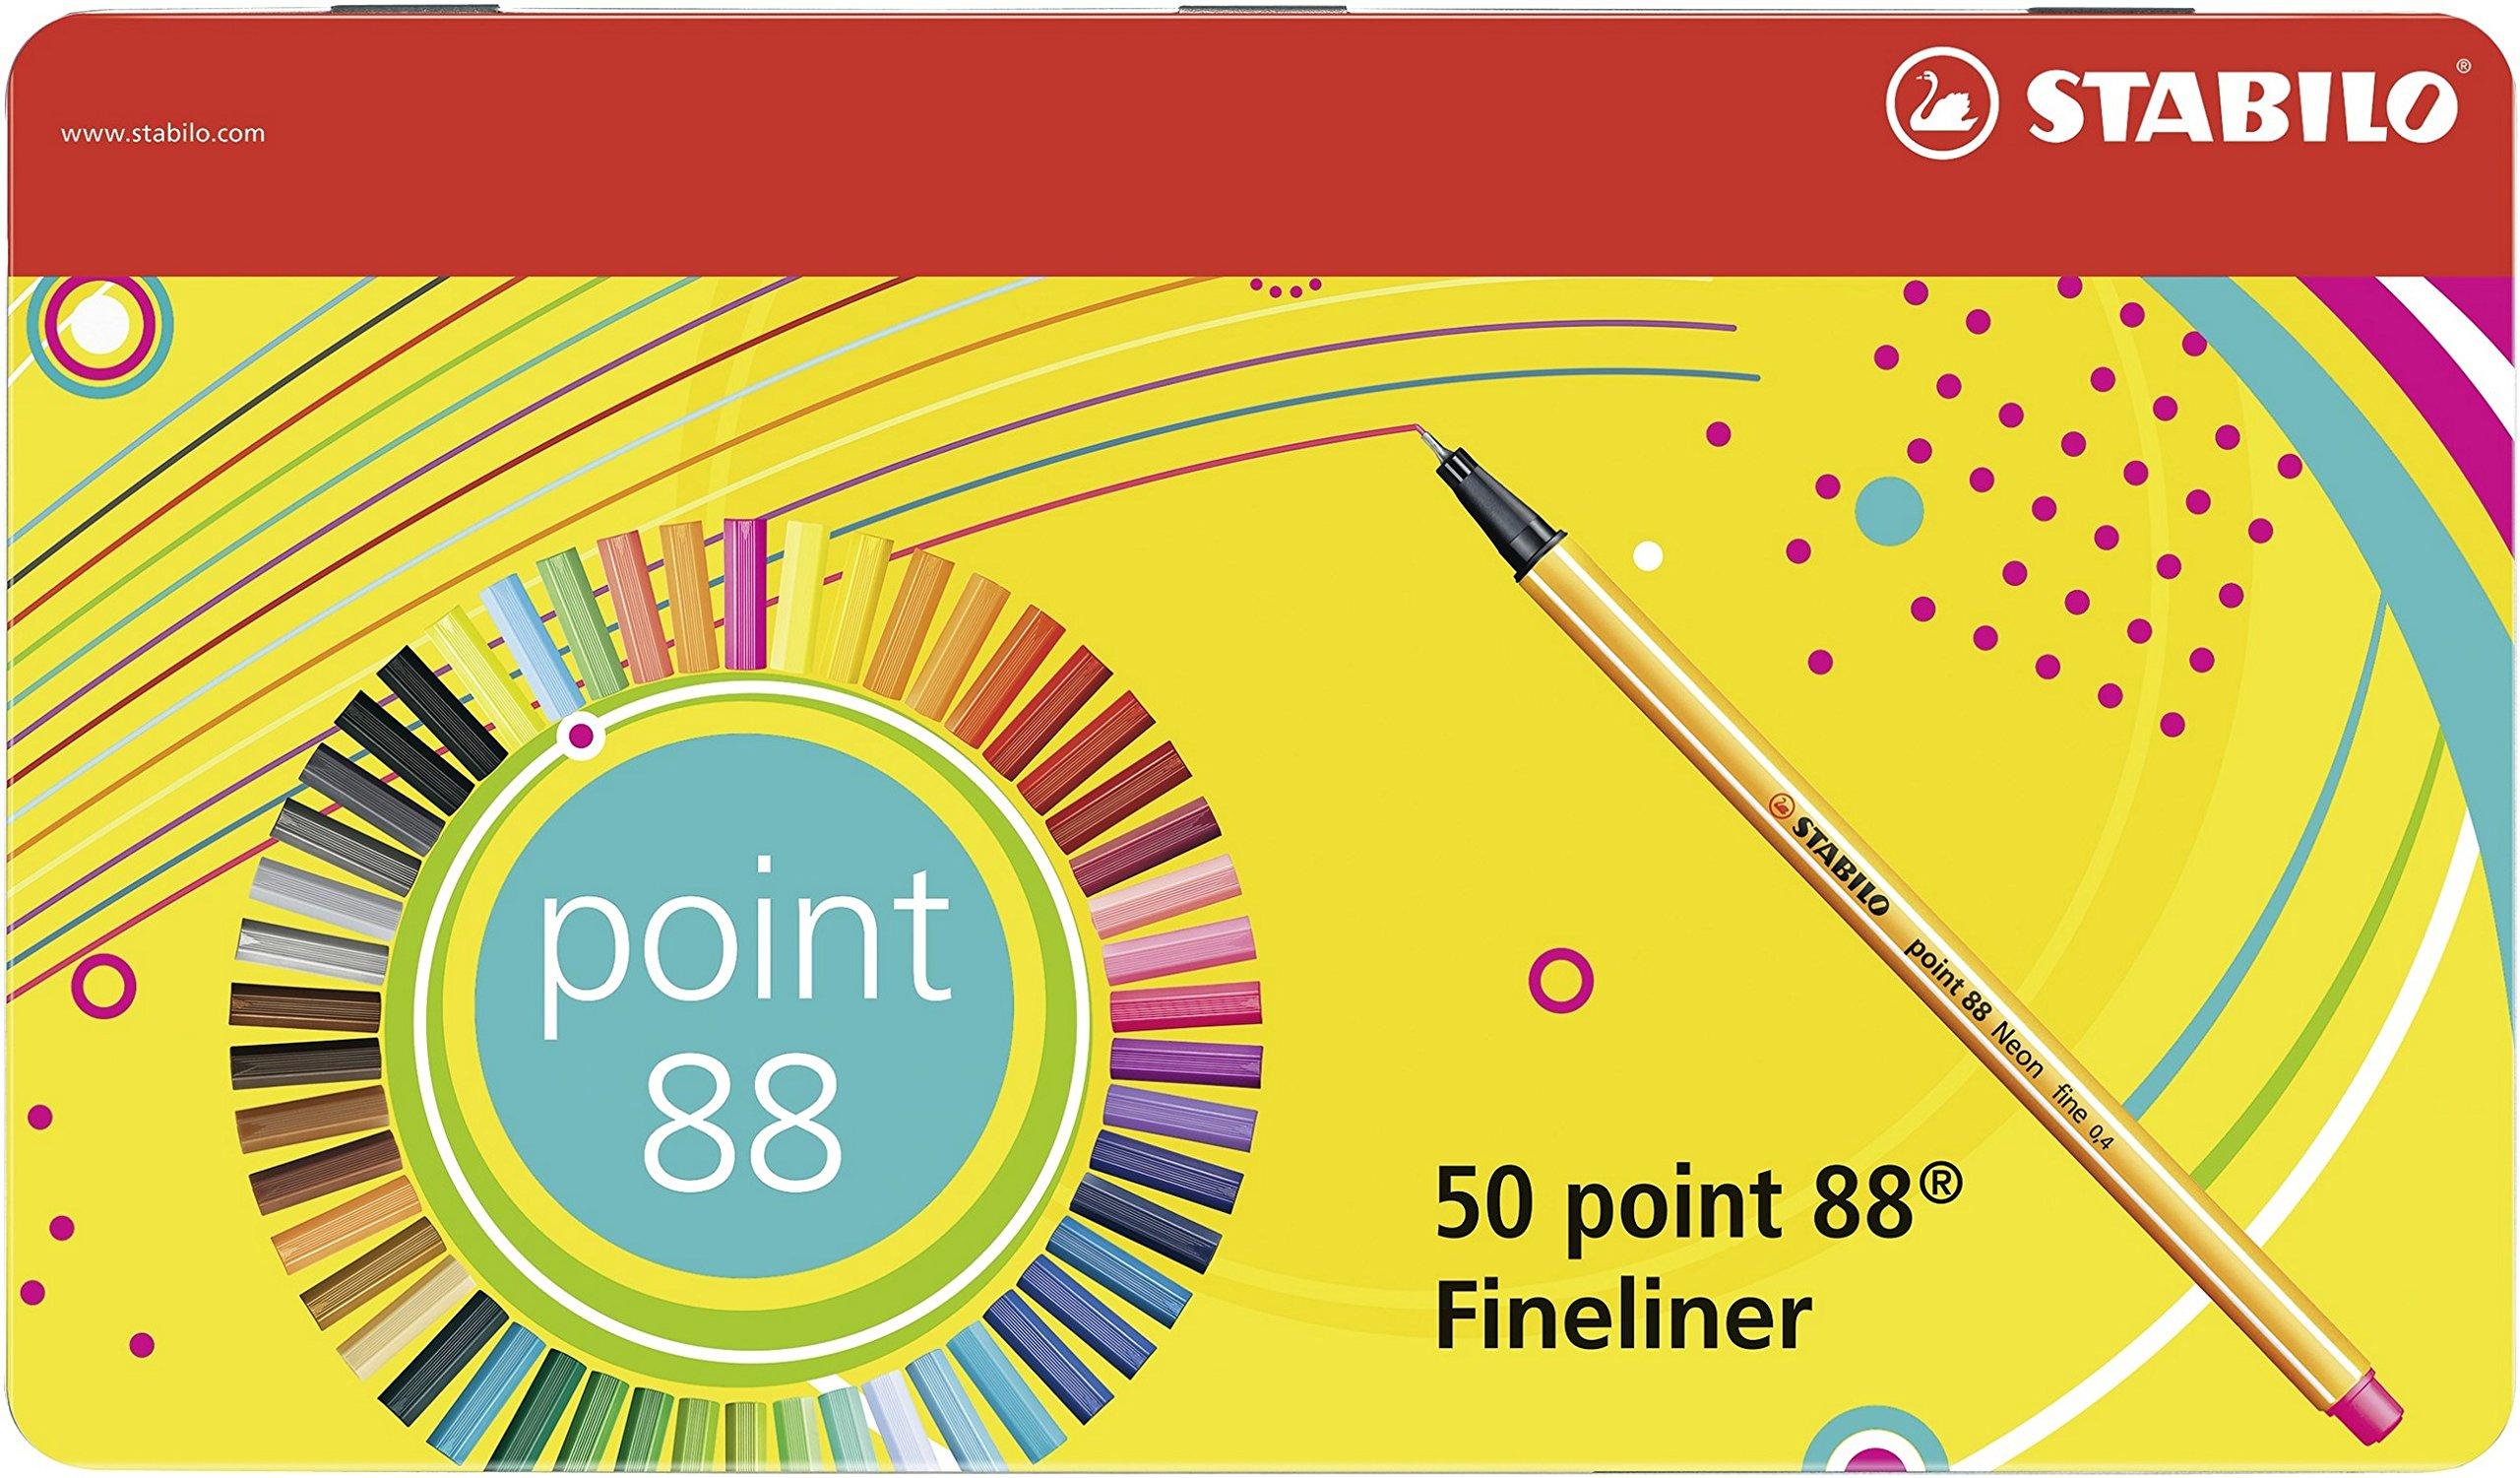 Rotulador puntafina STABILO point 88 – Caja de metal con 50 unidades (46 colores)